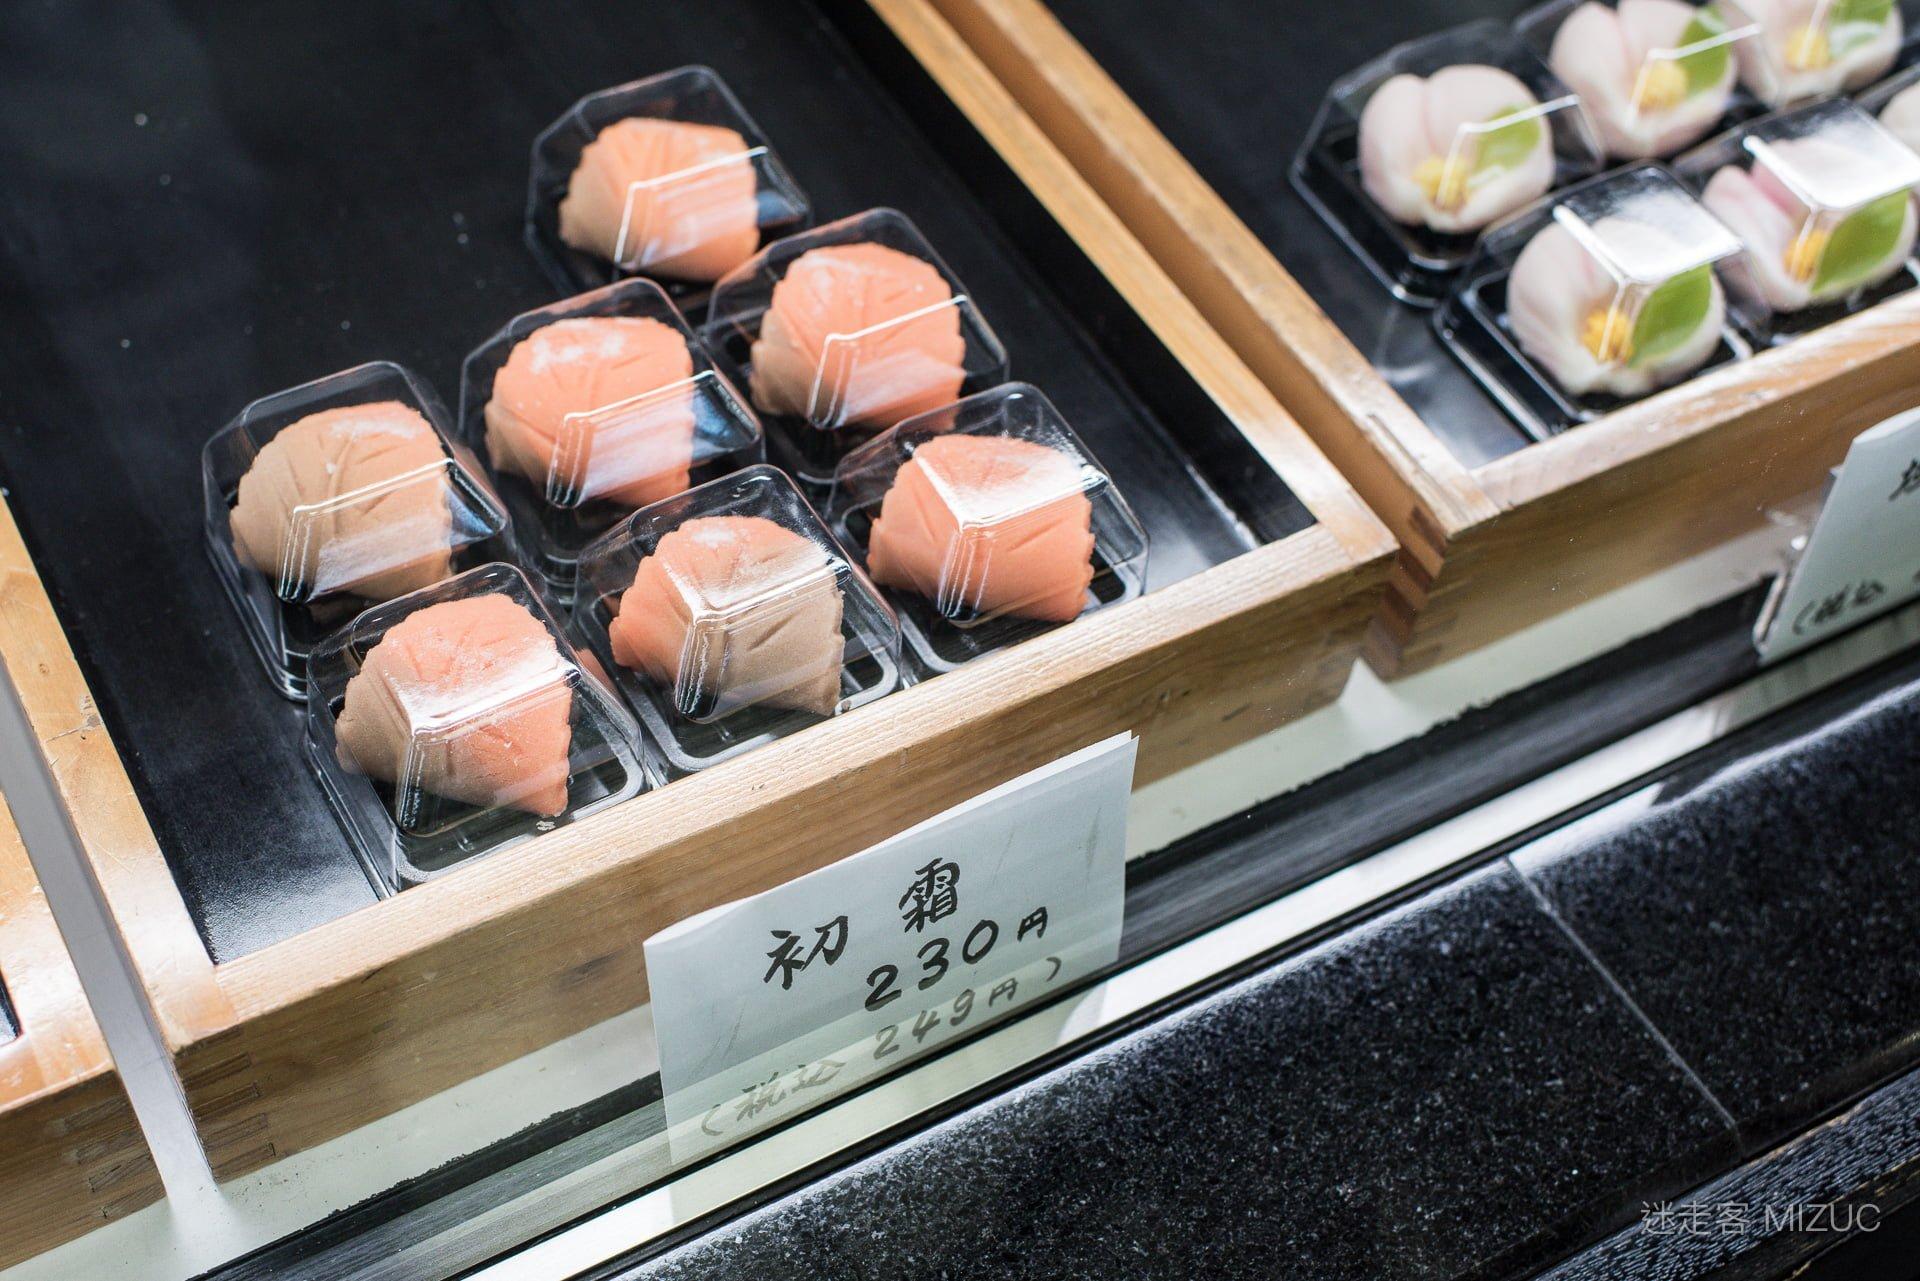 201711 Ibaraki Tochigi Gunma Japan Travel By RentalCar 67 日本自駕旅遊/北關東三縣「茨城、櫪木、群馬」秋天美食、溫泉與瀑布秘境百景(精選照片分享)